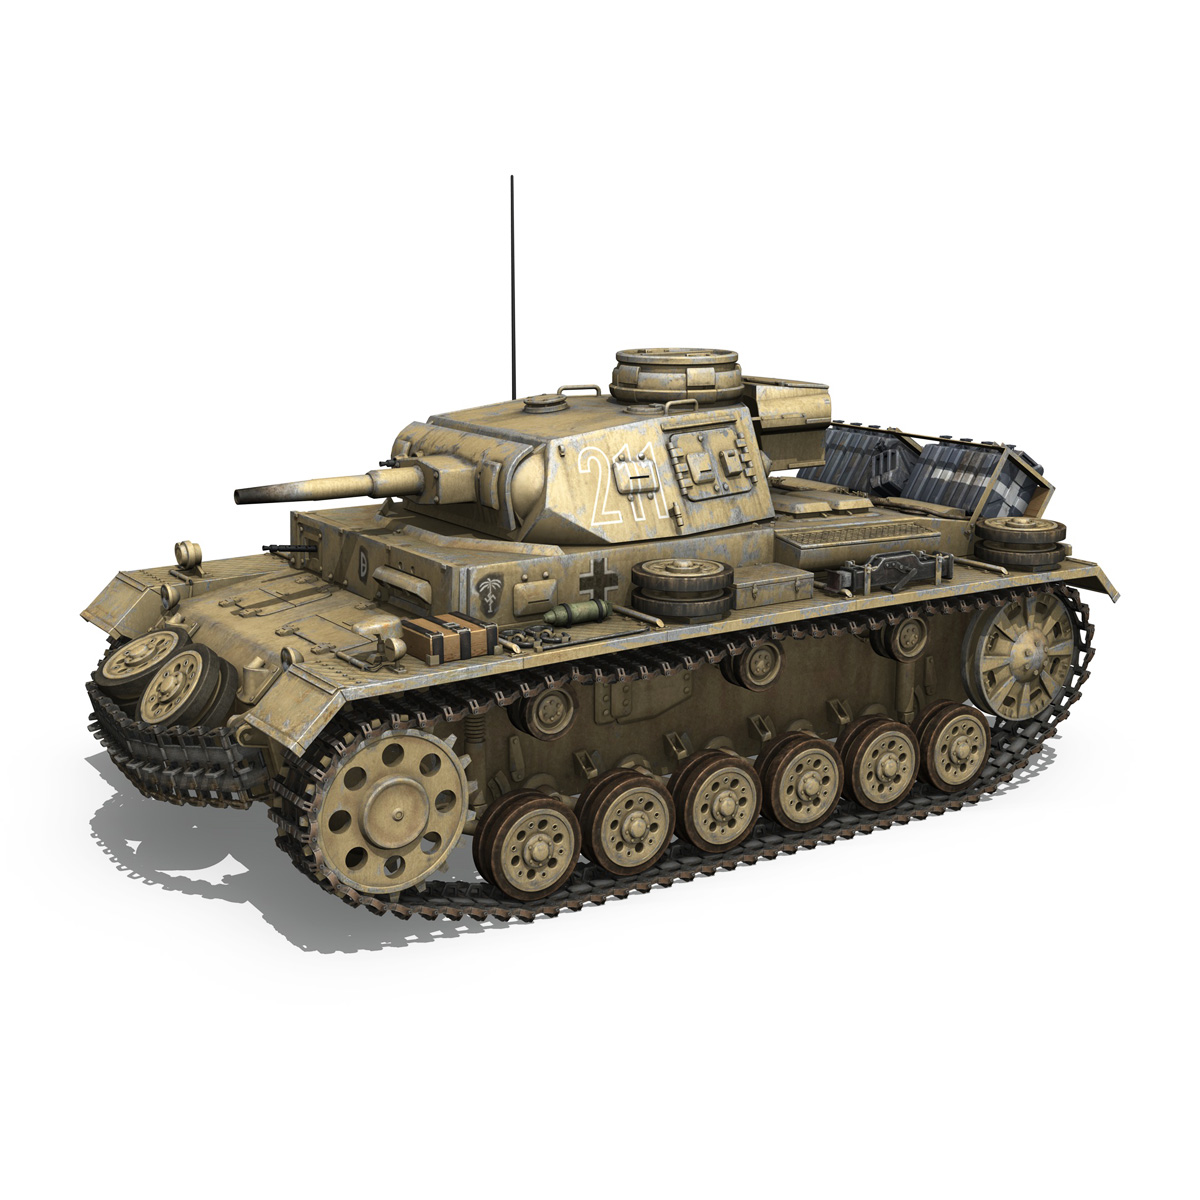 pzkpfw iii – panzer 3 – ausf.g – dak – 211 3d model 3ds c4d fbx lwo lw lws obj 266464